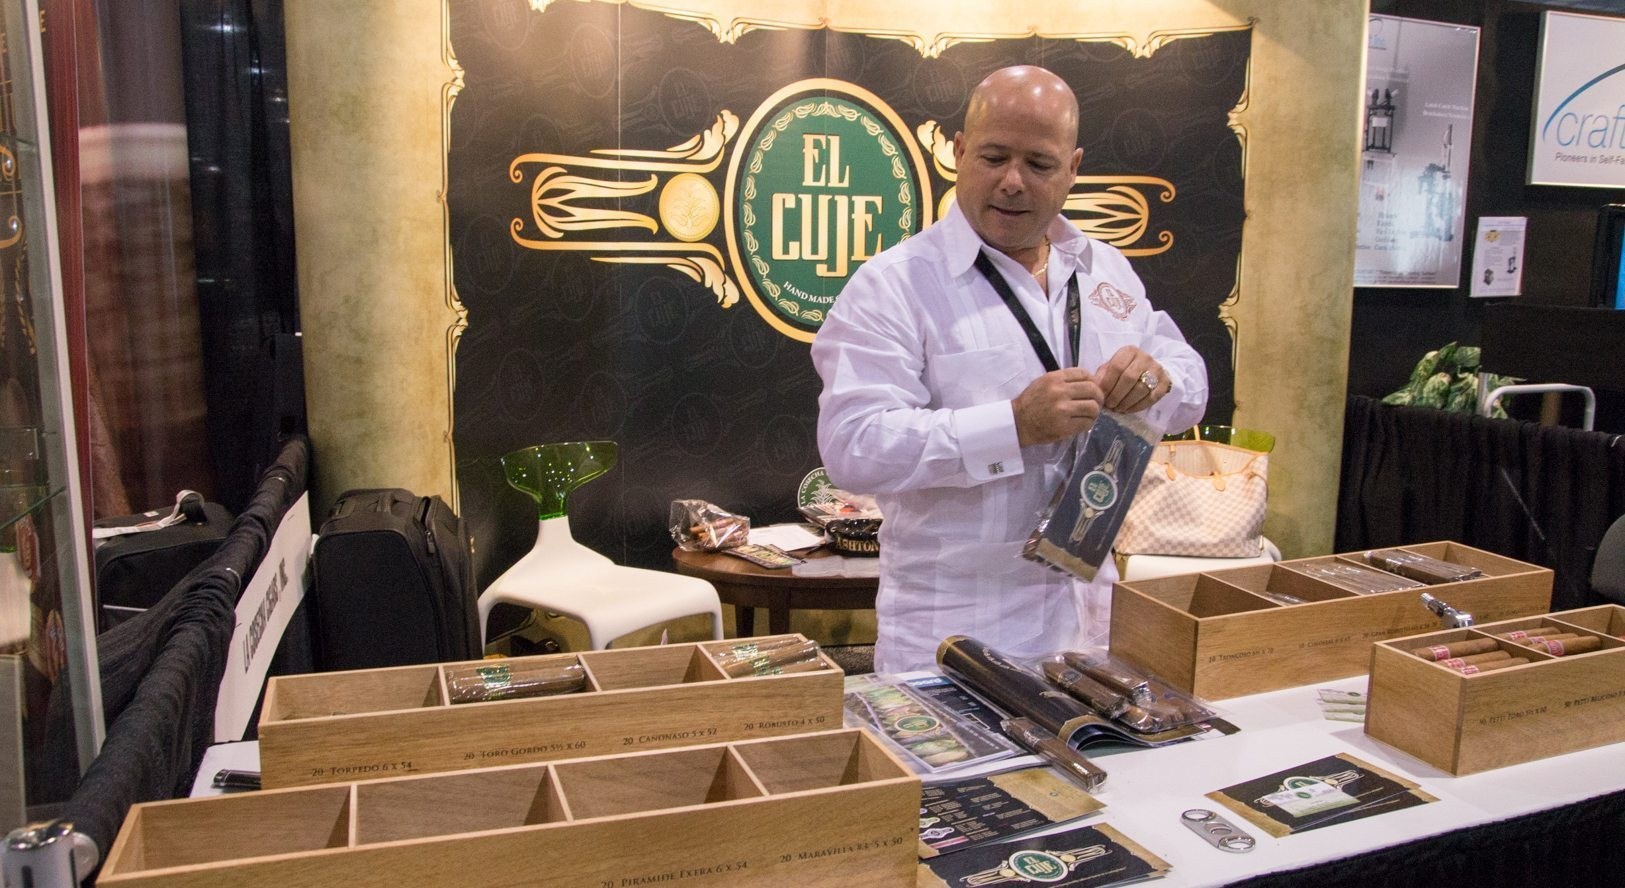 Blind Cigar Review: El Cuje | Big Boss Collection Toro Gordo